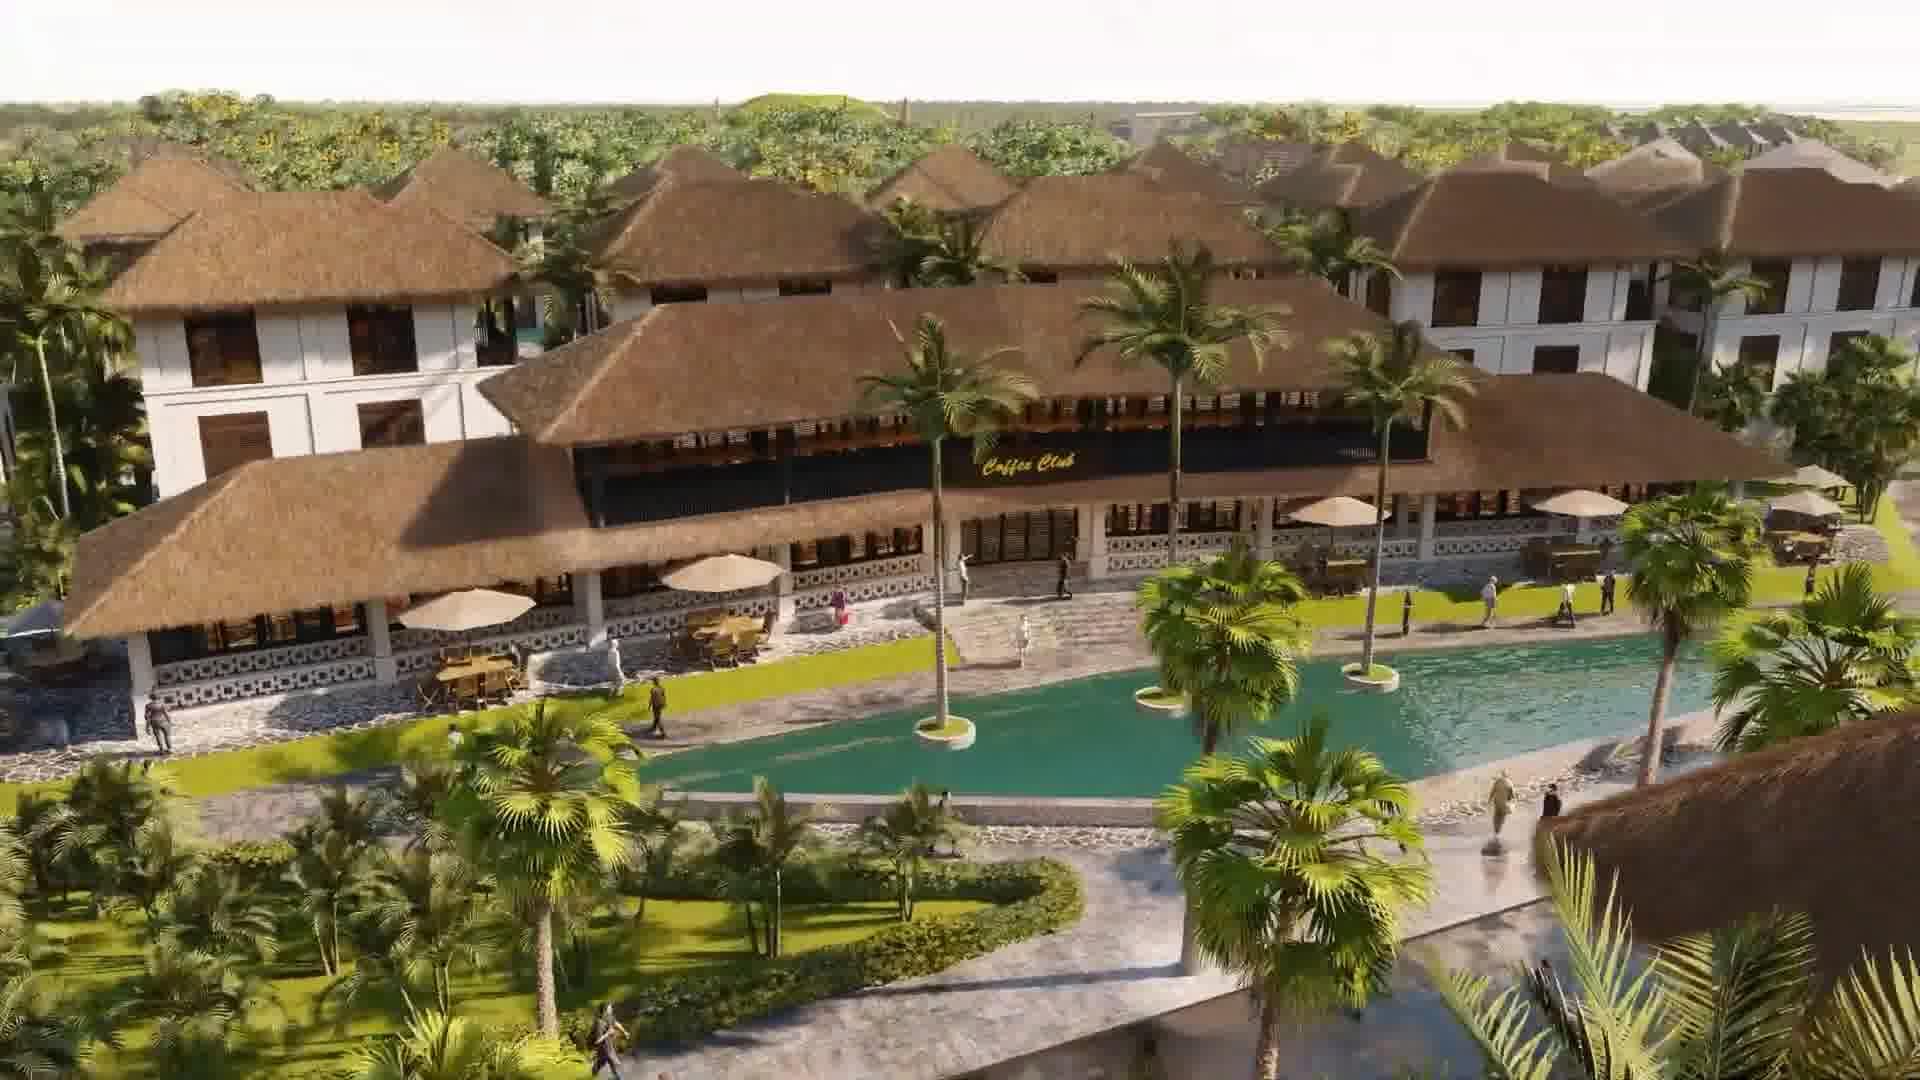 sunshine-heritage-resort-header